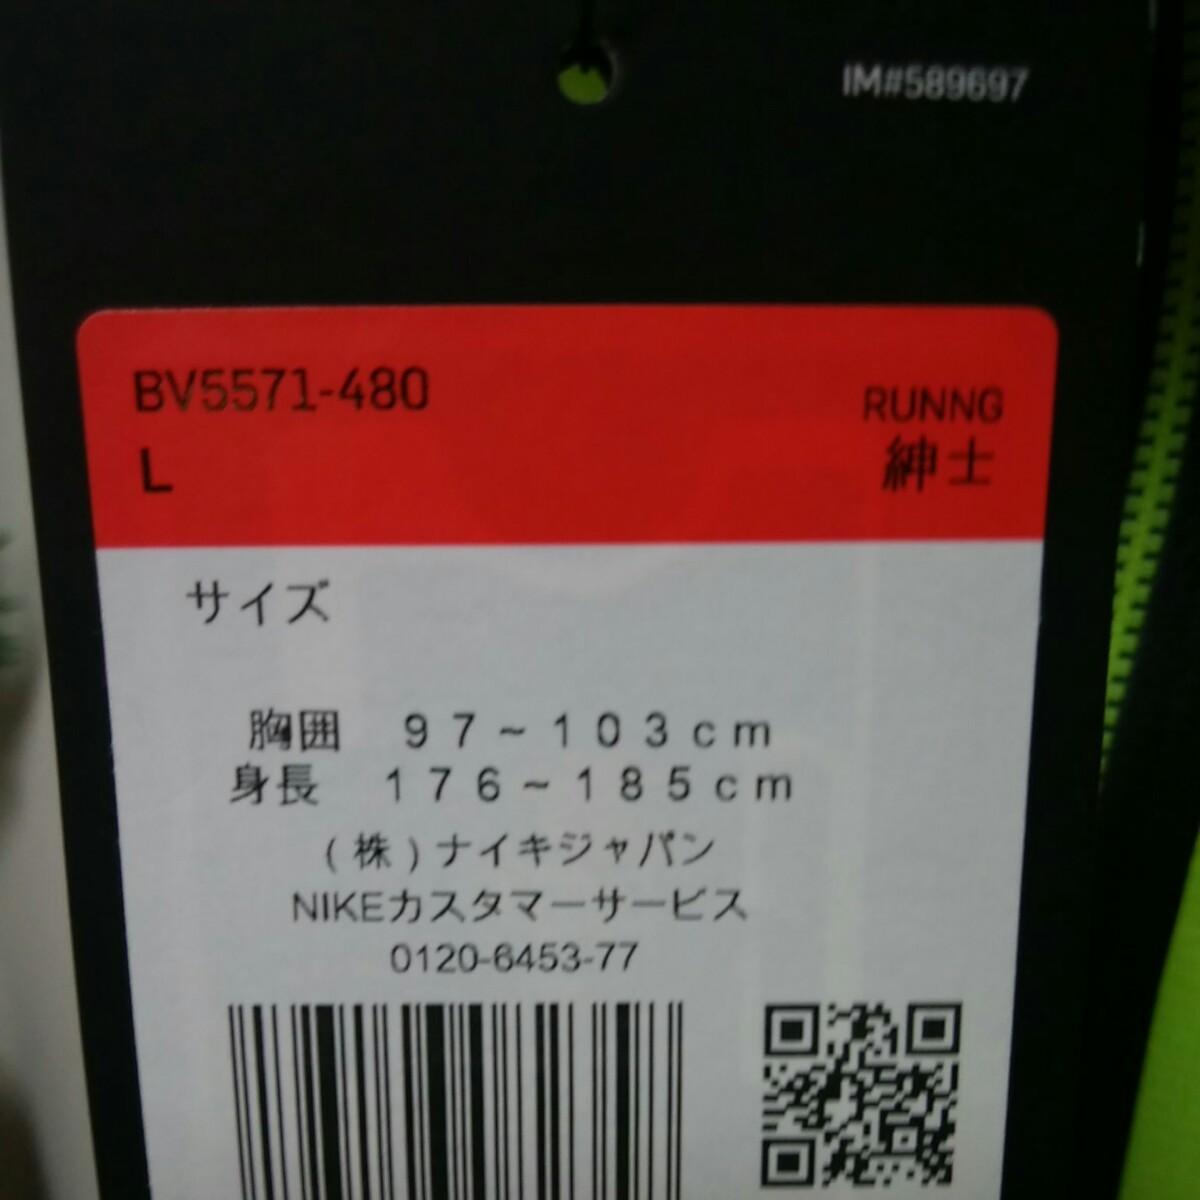 NIKE ナイキ 未使用 メンズL トレーニング ランニング ウェア